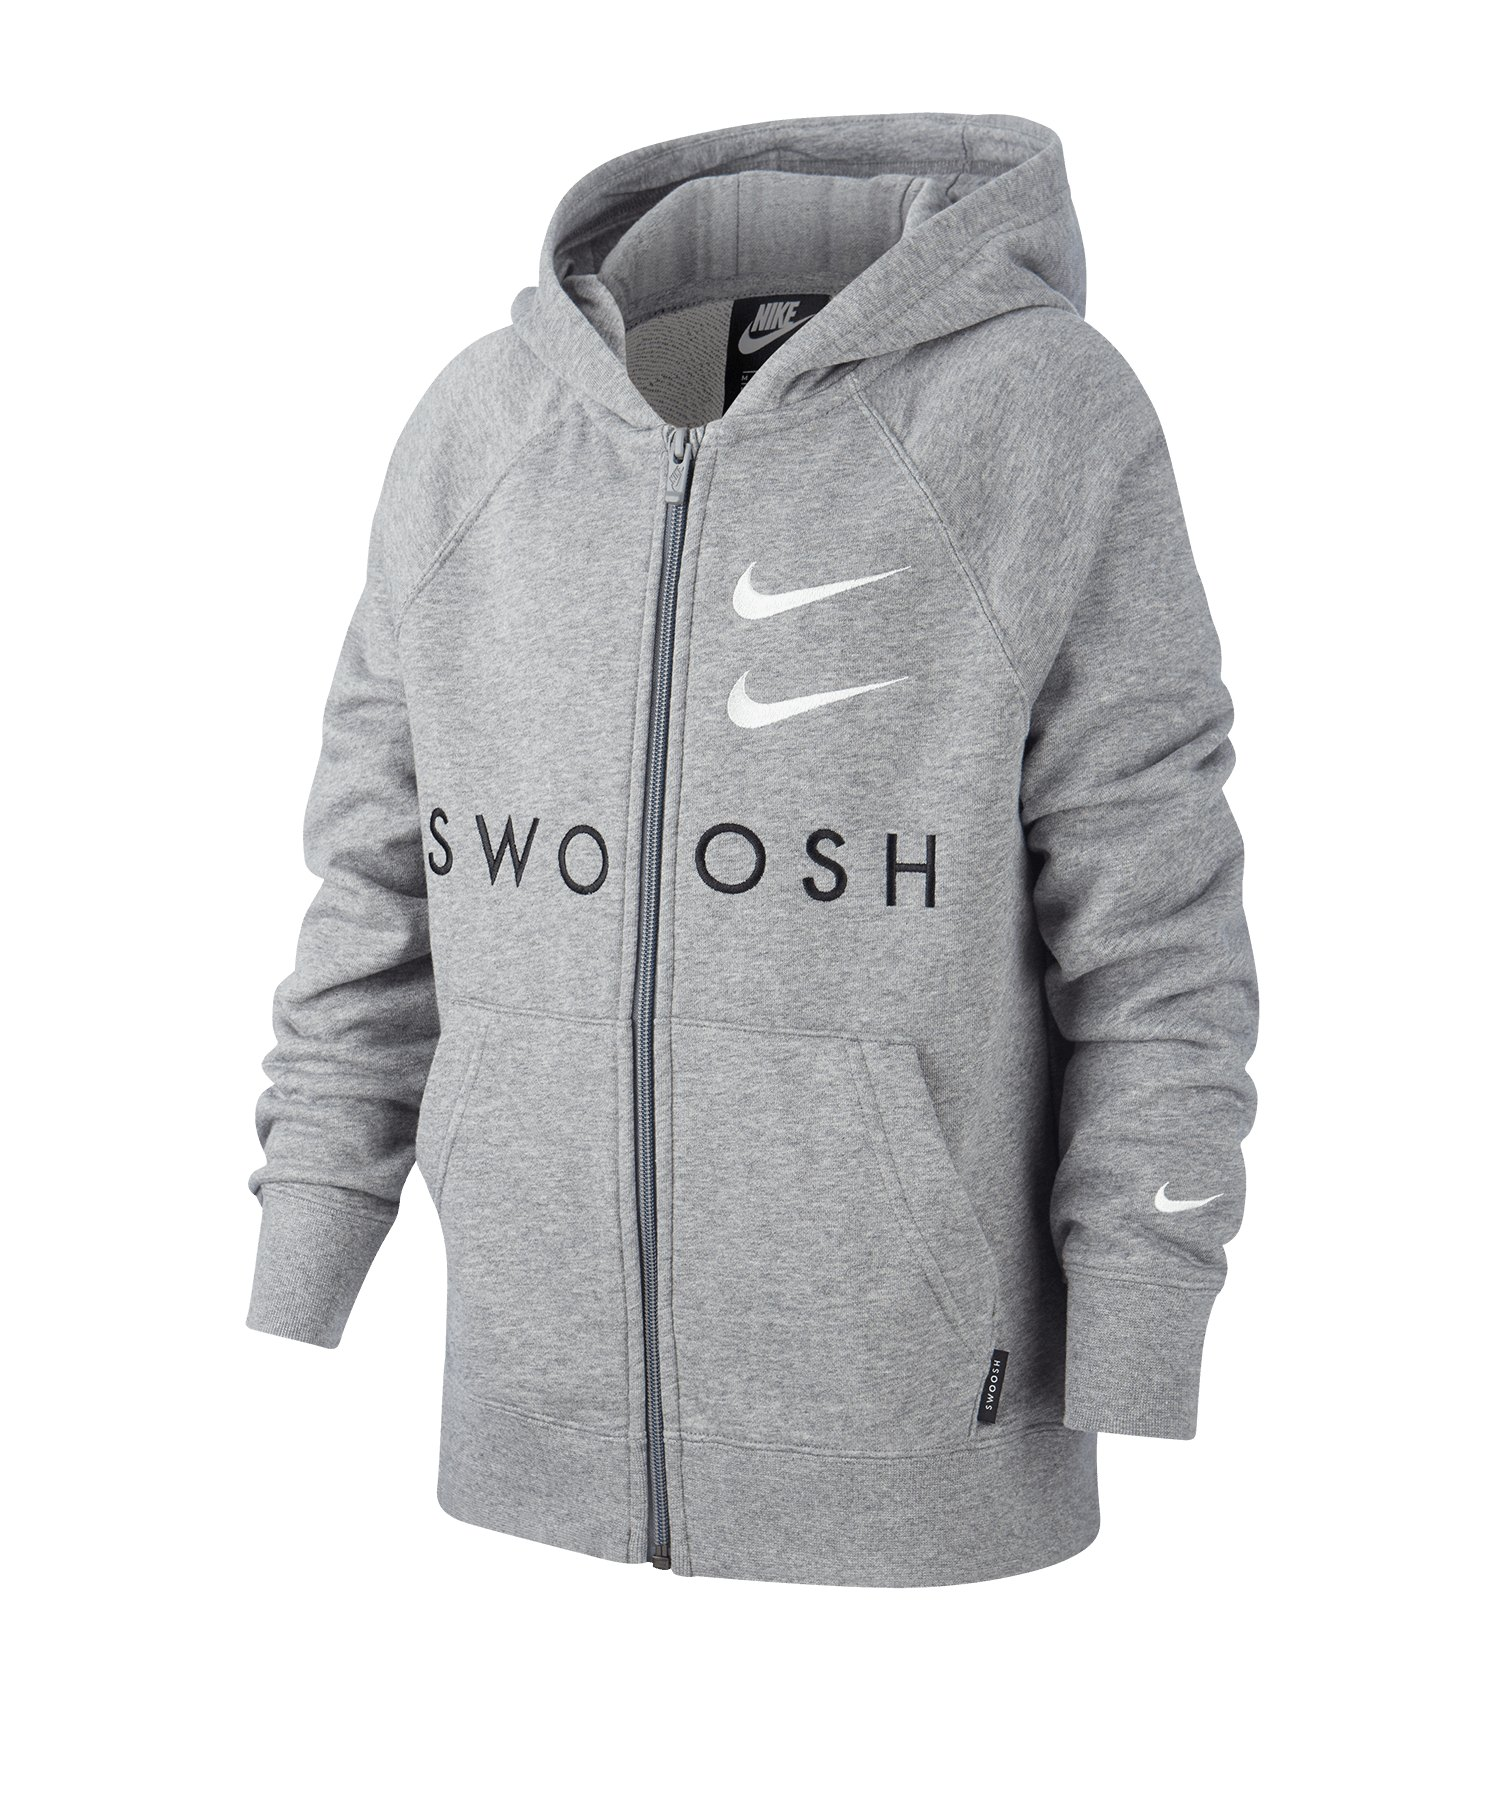 Nike Swoosh Kapuzenjacke Kids Grau F091 - grau